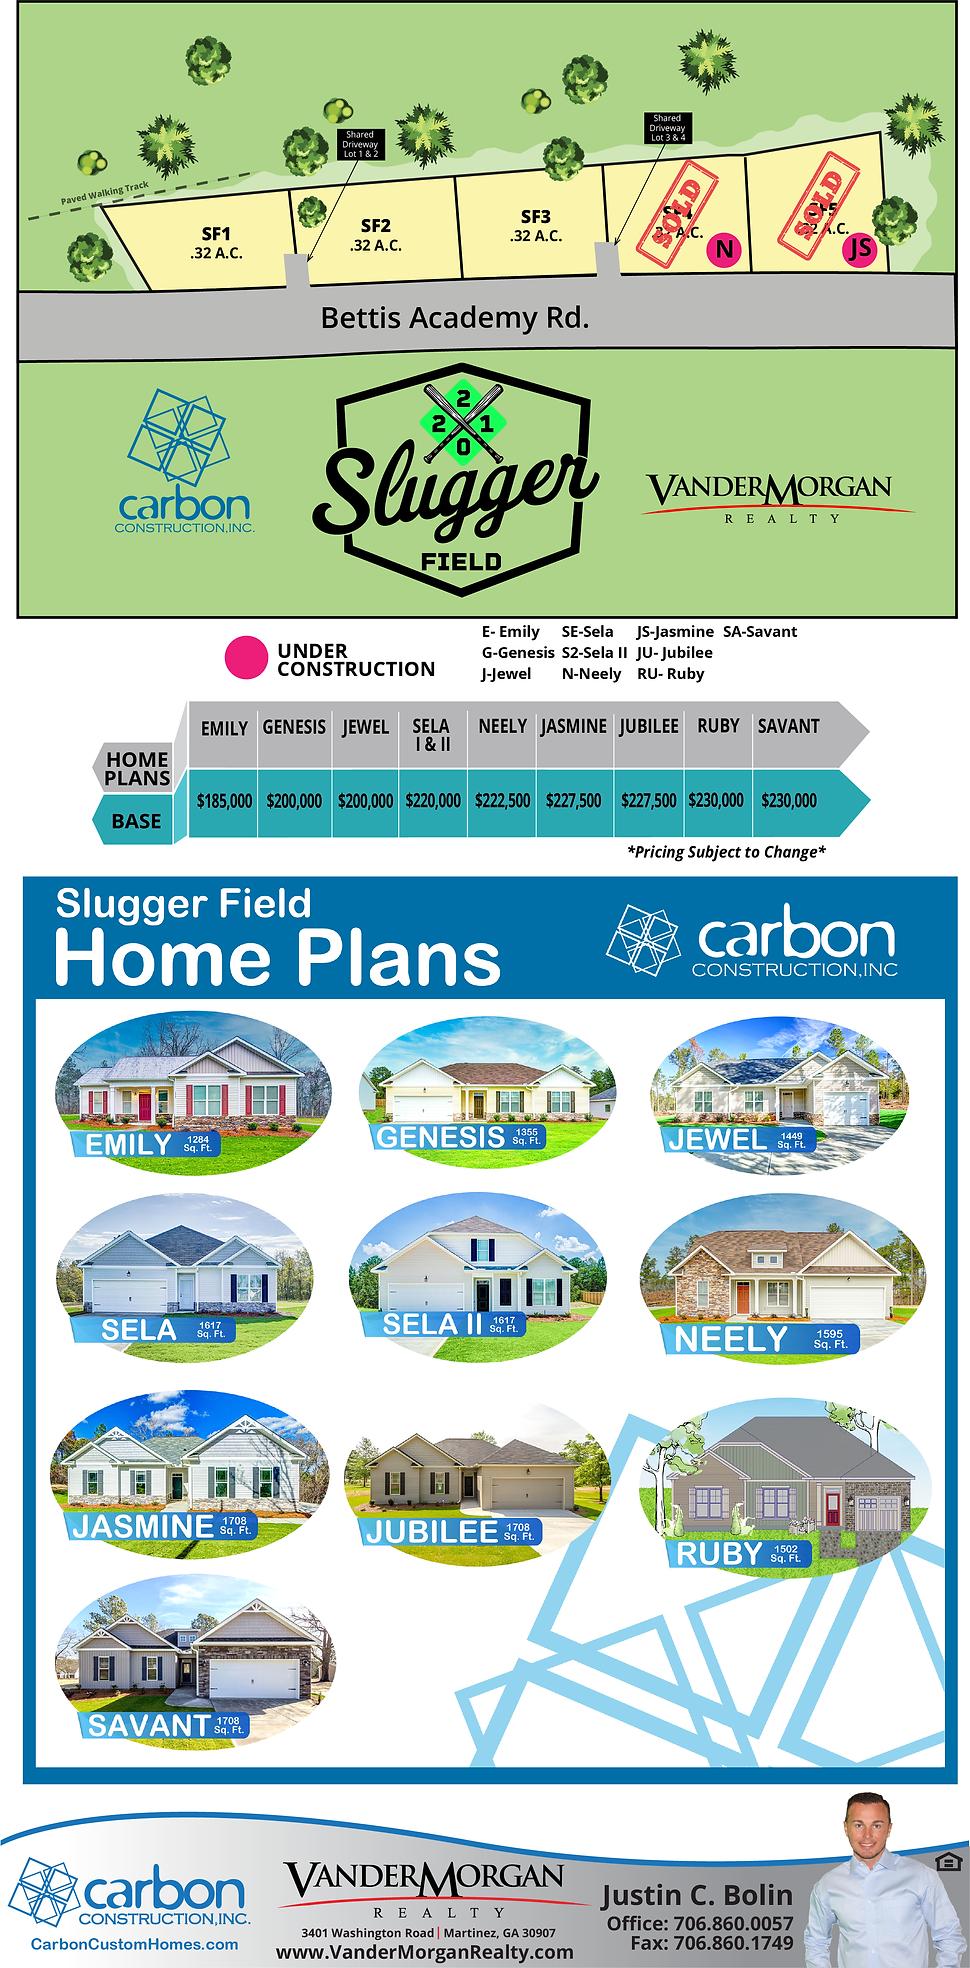 Sell Sheet Slugger Field July 18 2021.png